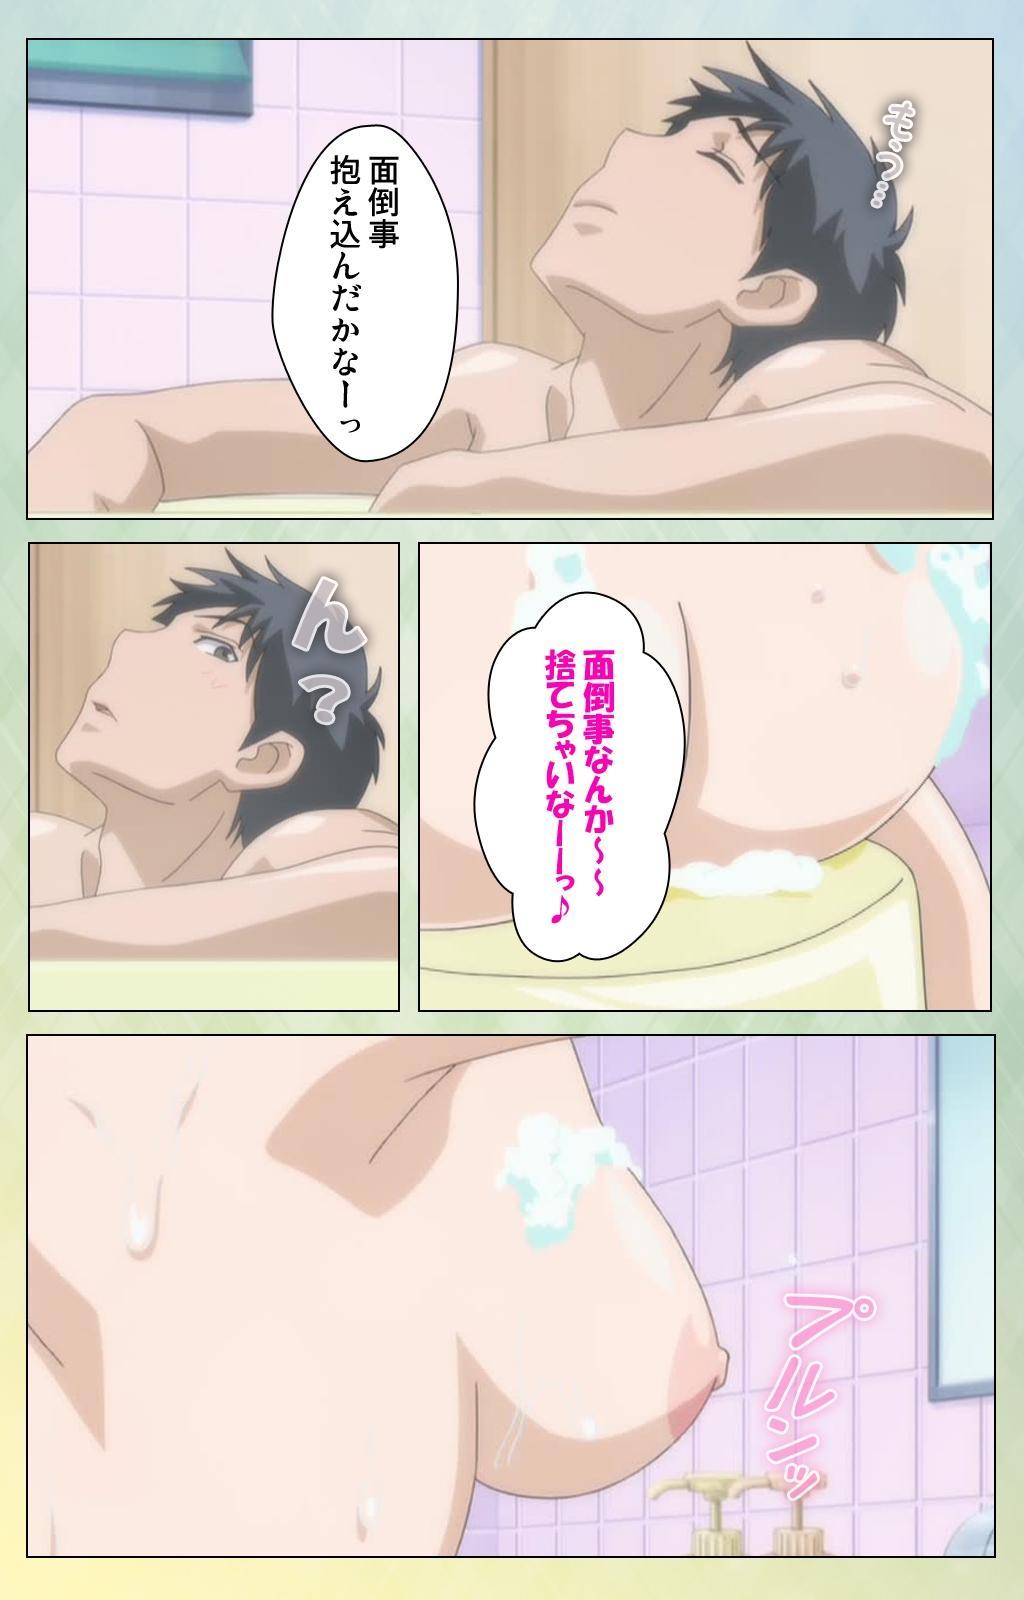 Furueru Kuchibiru fuzzy lips0 Complete Ban 46